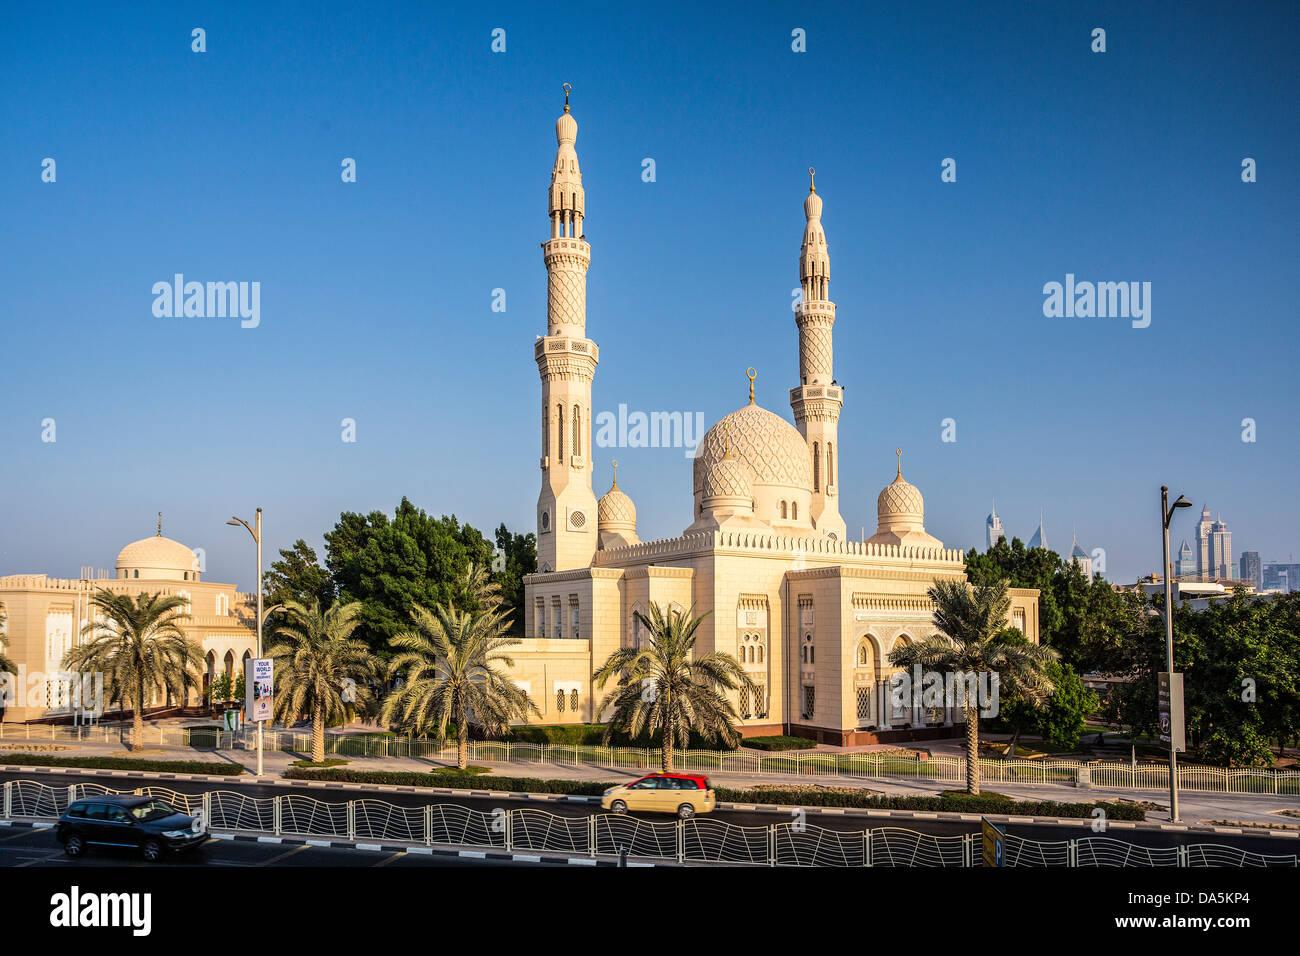 united arab emirates uae dubai city jumeirah mosque dubai stock photo 57902940 alamy. Black Bedroom Furniture Sets. Home Design Ideas